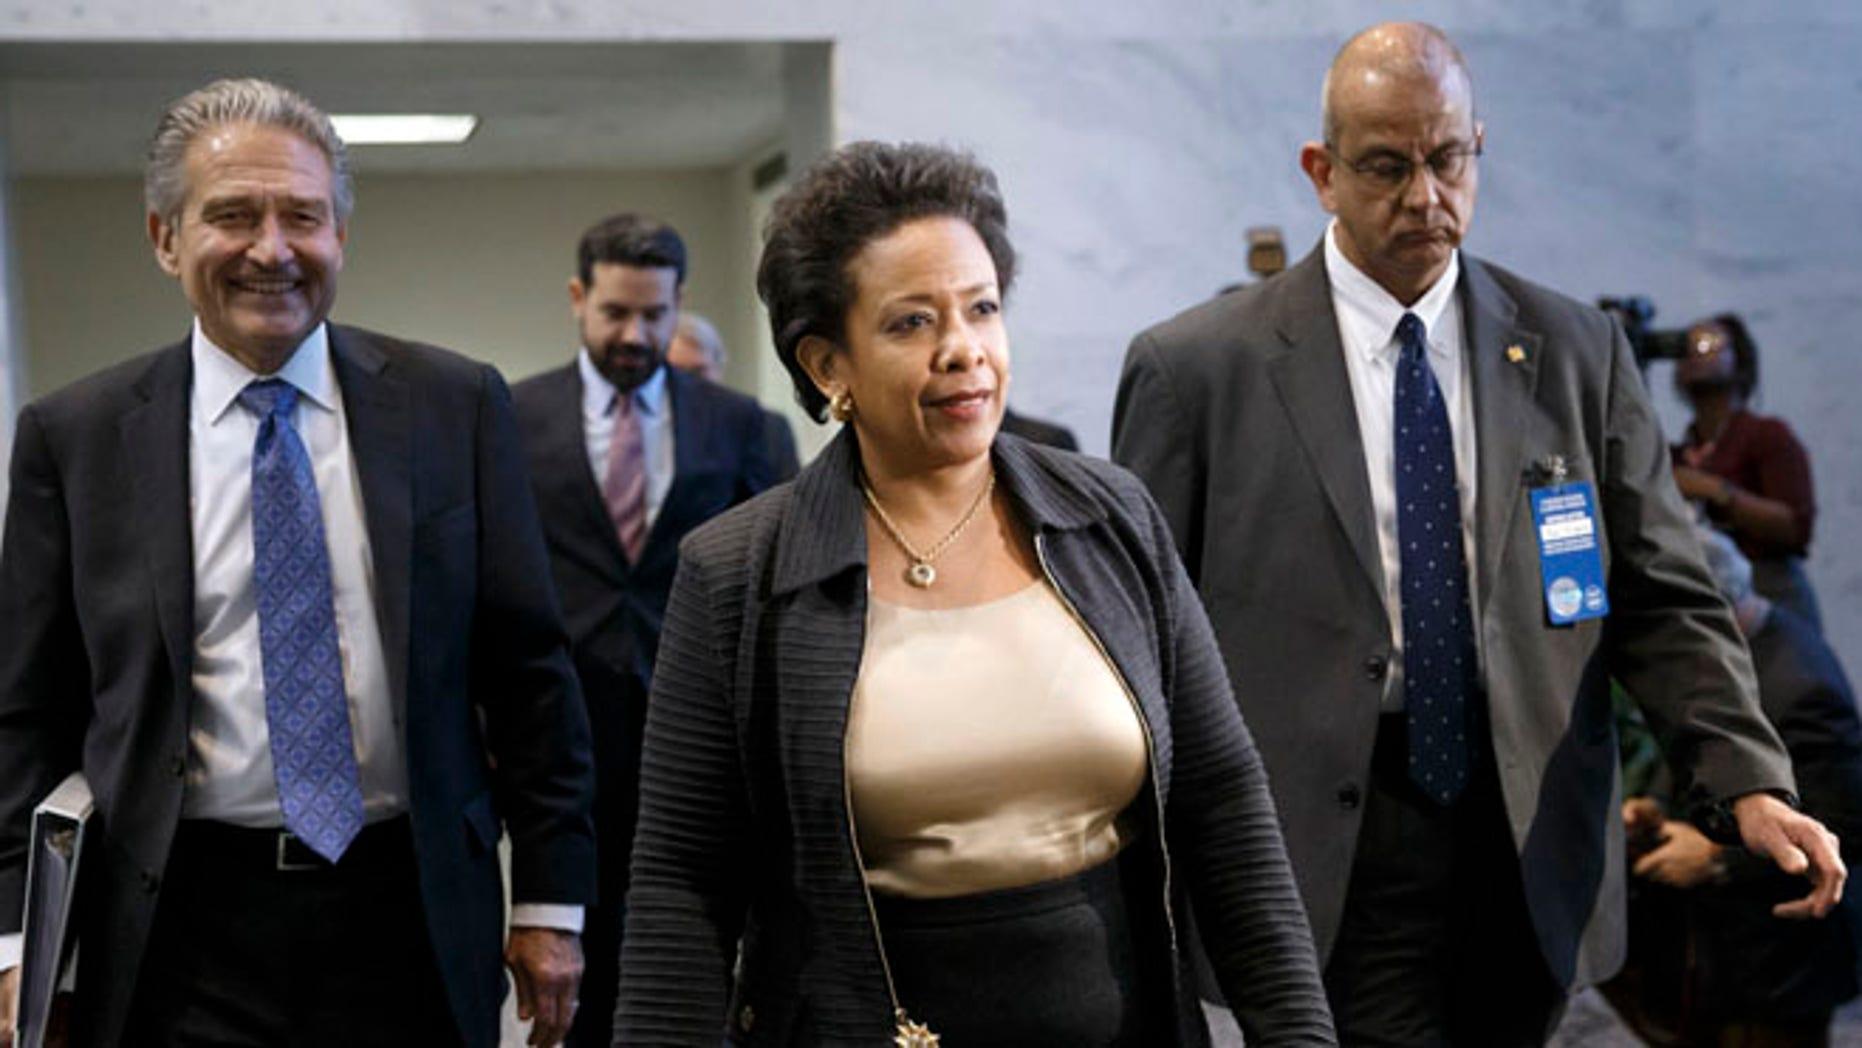 FILE: Dec. 2, 2014: Attorney General nominee Loretta Lynch on Capitol Hill, in Washington, D.C.